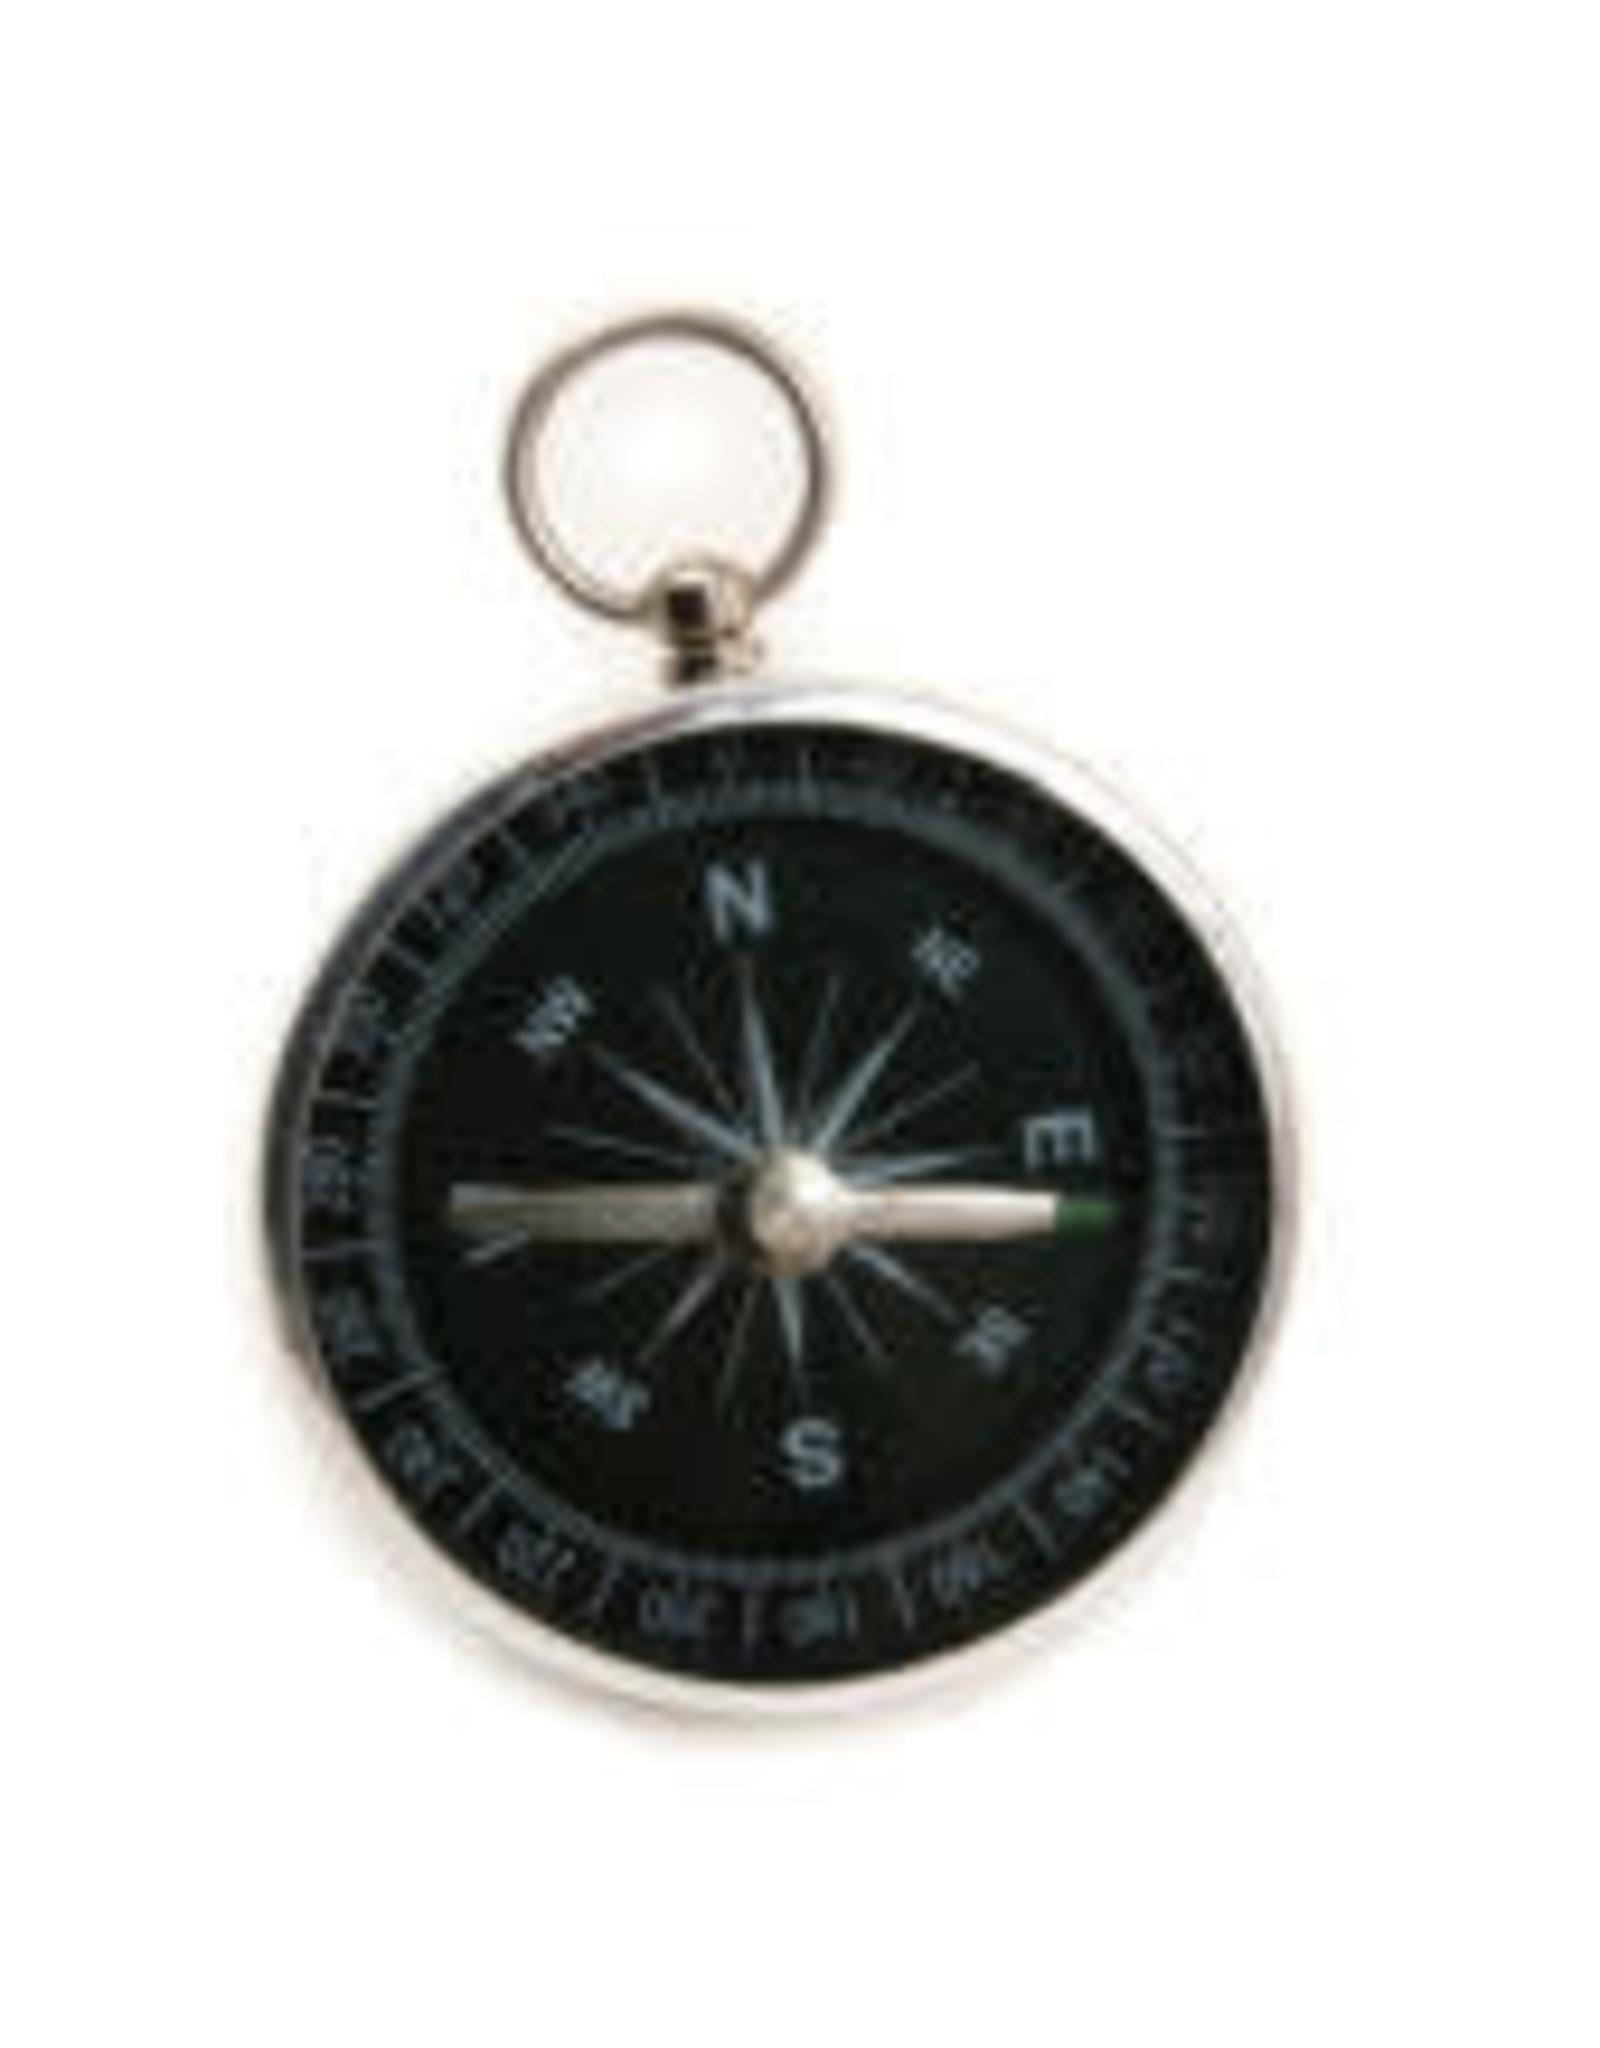 house of marbles Adventurer's Compass hom 230007